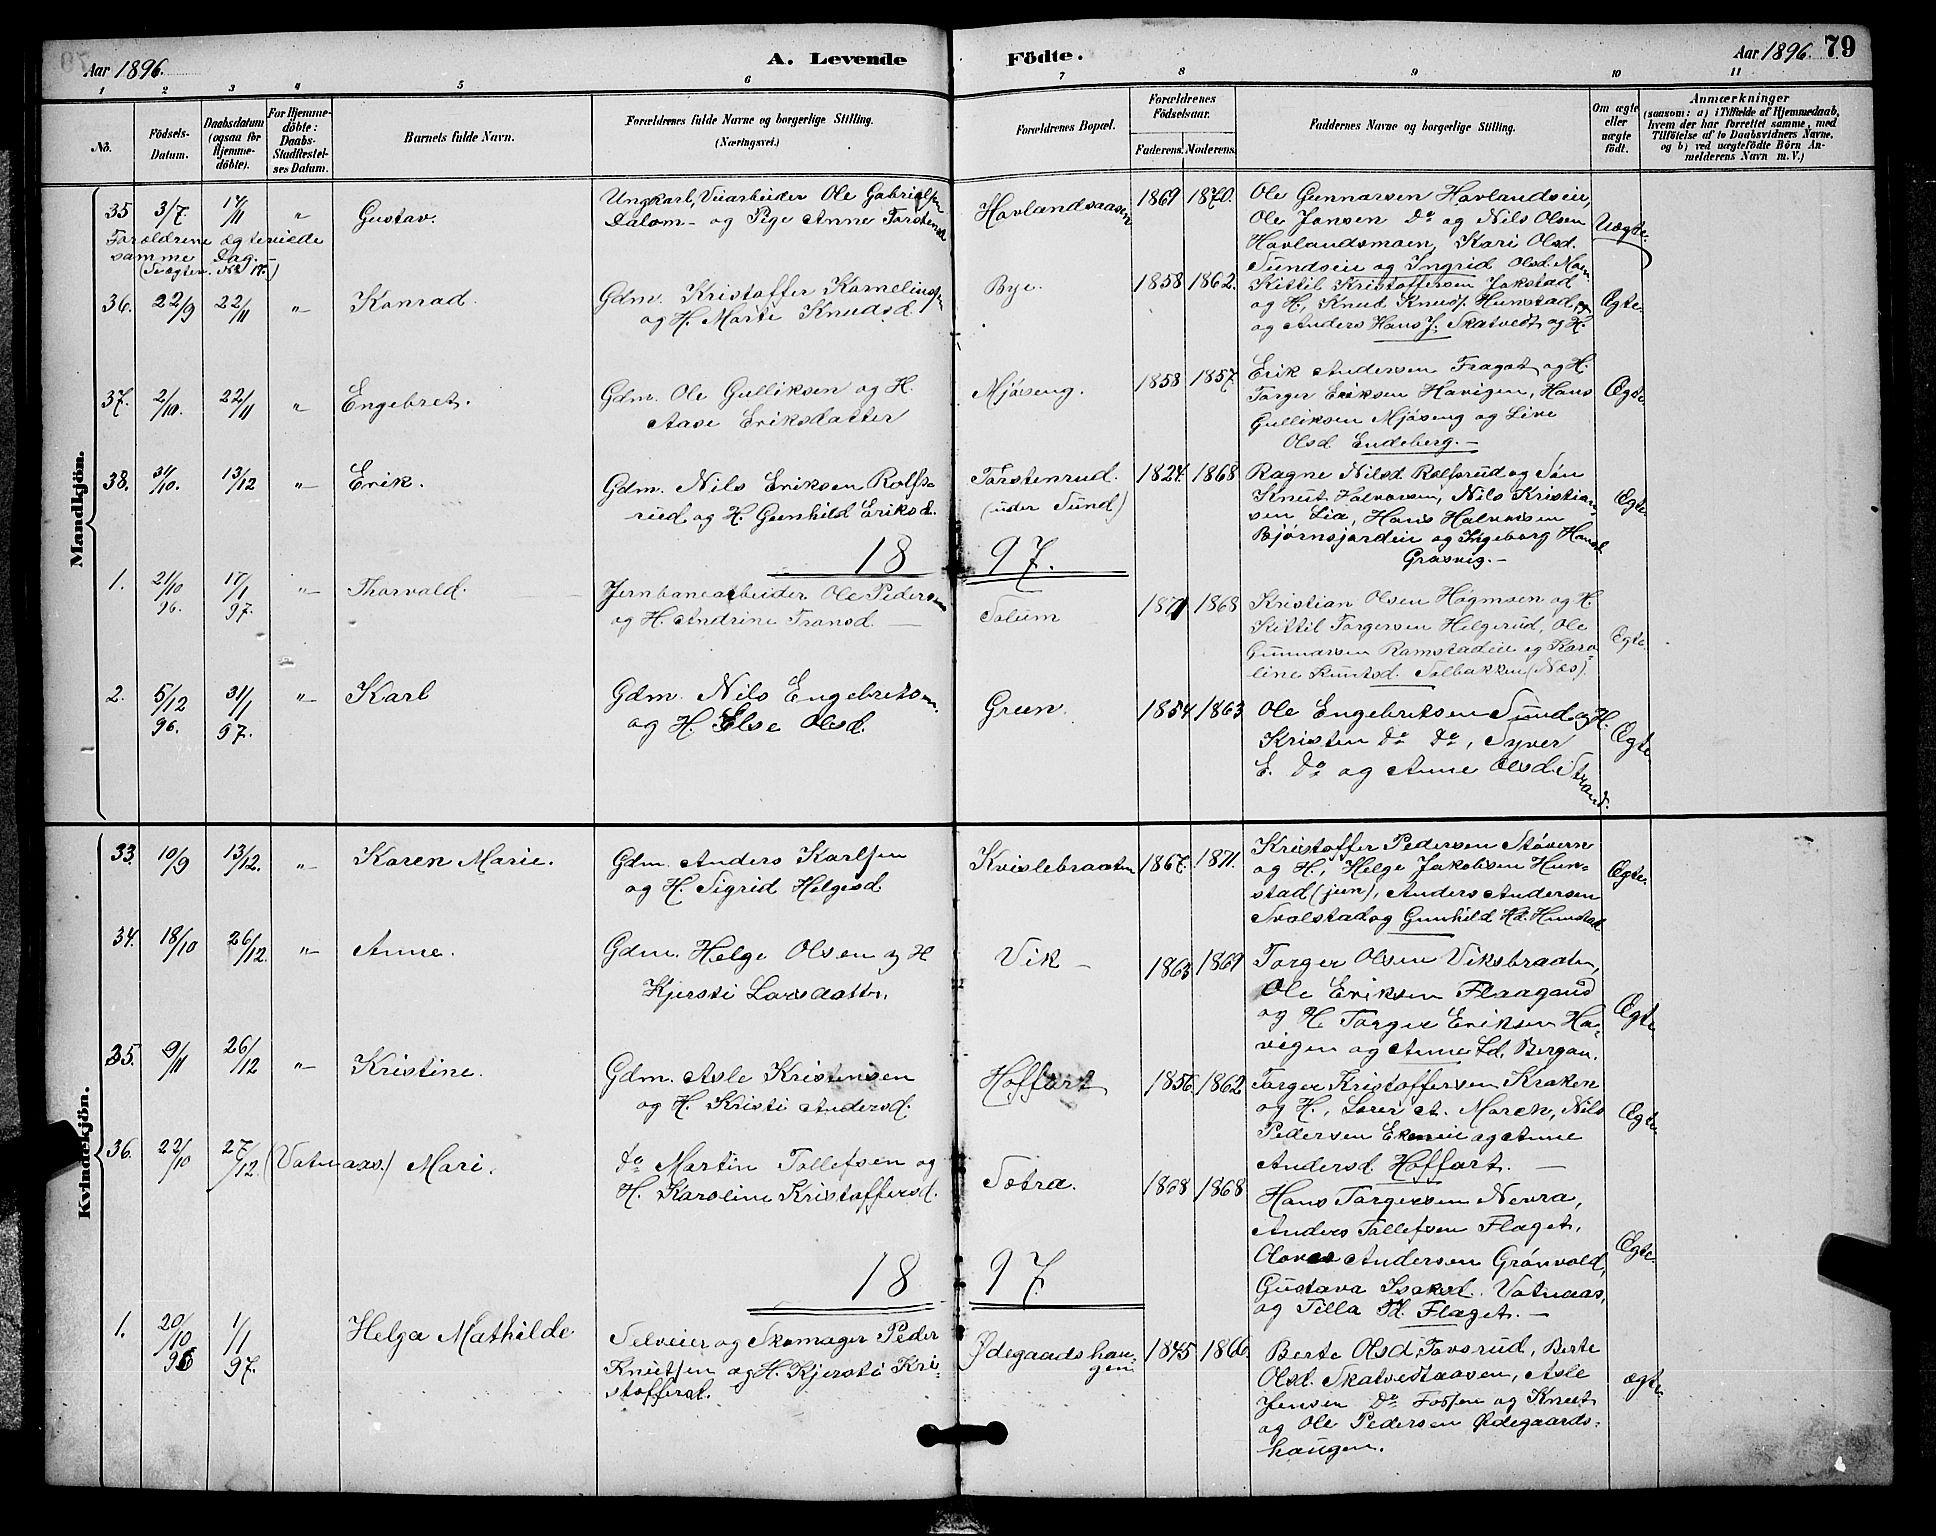 SAKO, Sigdal kirkebøker, G/Ga/L0005: Klokkerbok nr. I 5, 1886-1900, s. 79